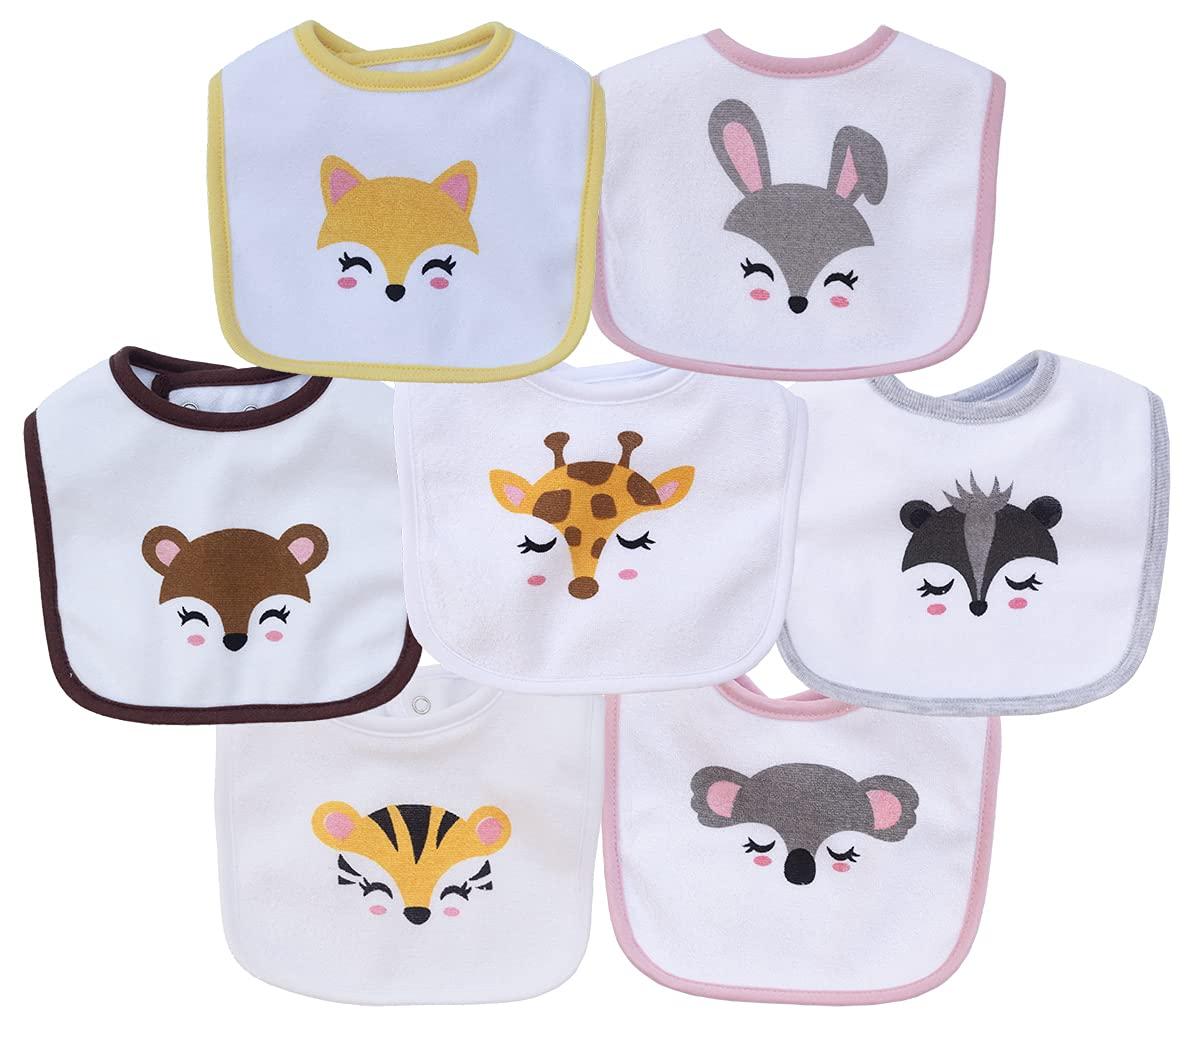 7 Pack Terry Waterproof Baby Bibs with Snaps for Girl Unisex, Drool,Eating and Teething Bibs